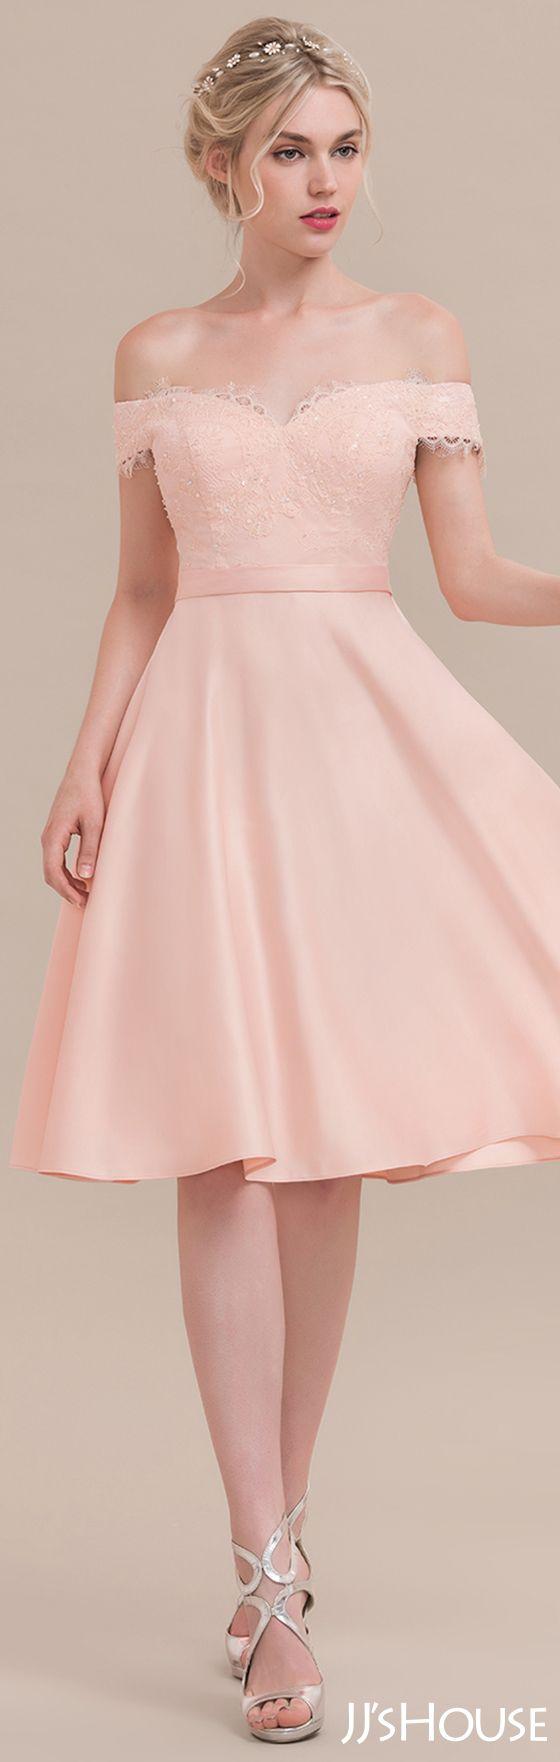 JJsHouse #Cocktail | Favorite Dress | Pinterest | Vestiditos ...